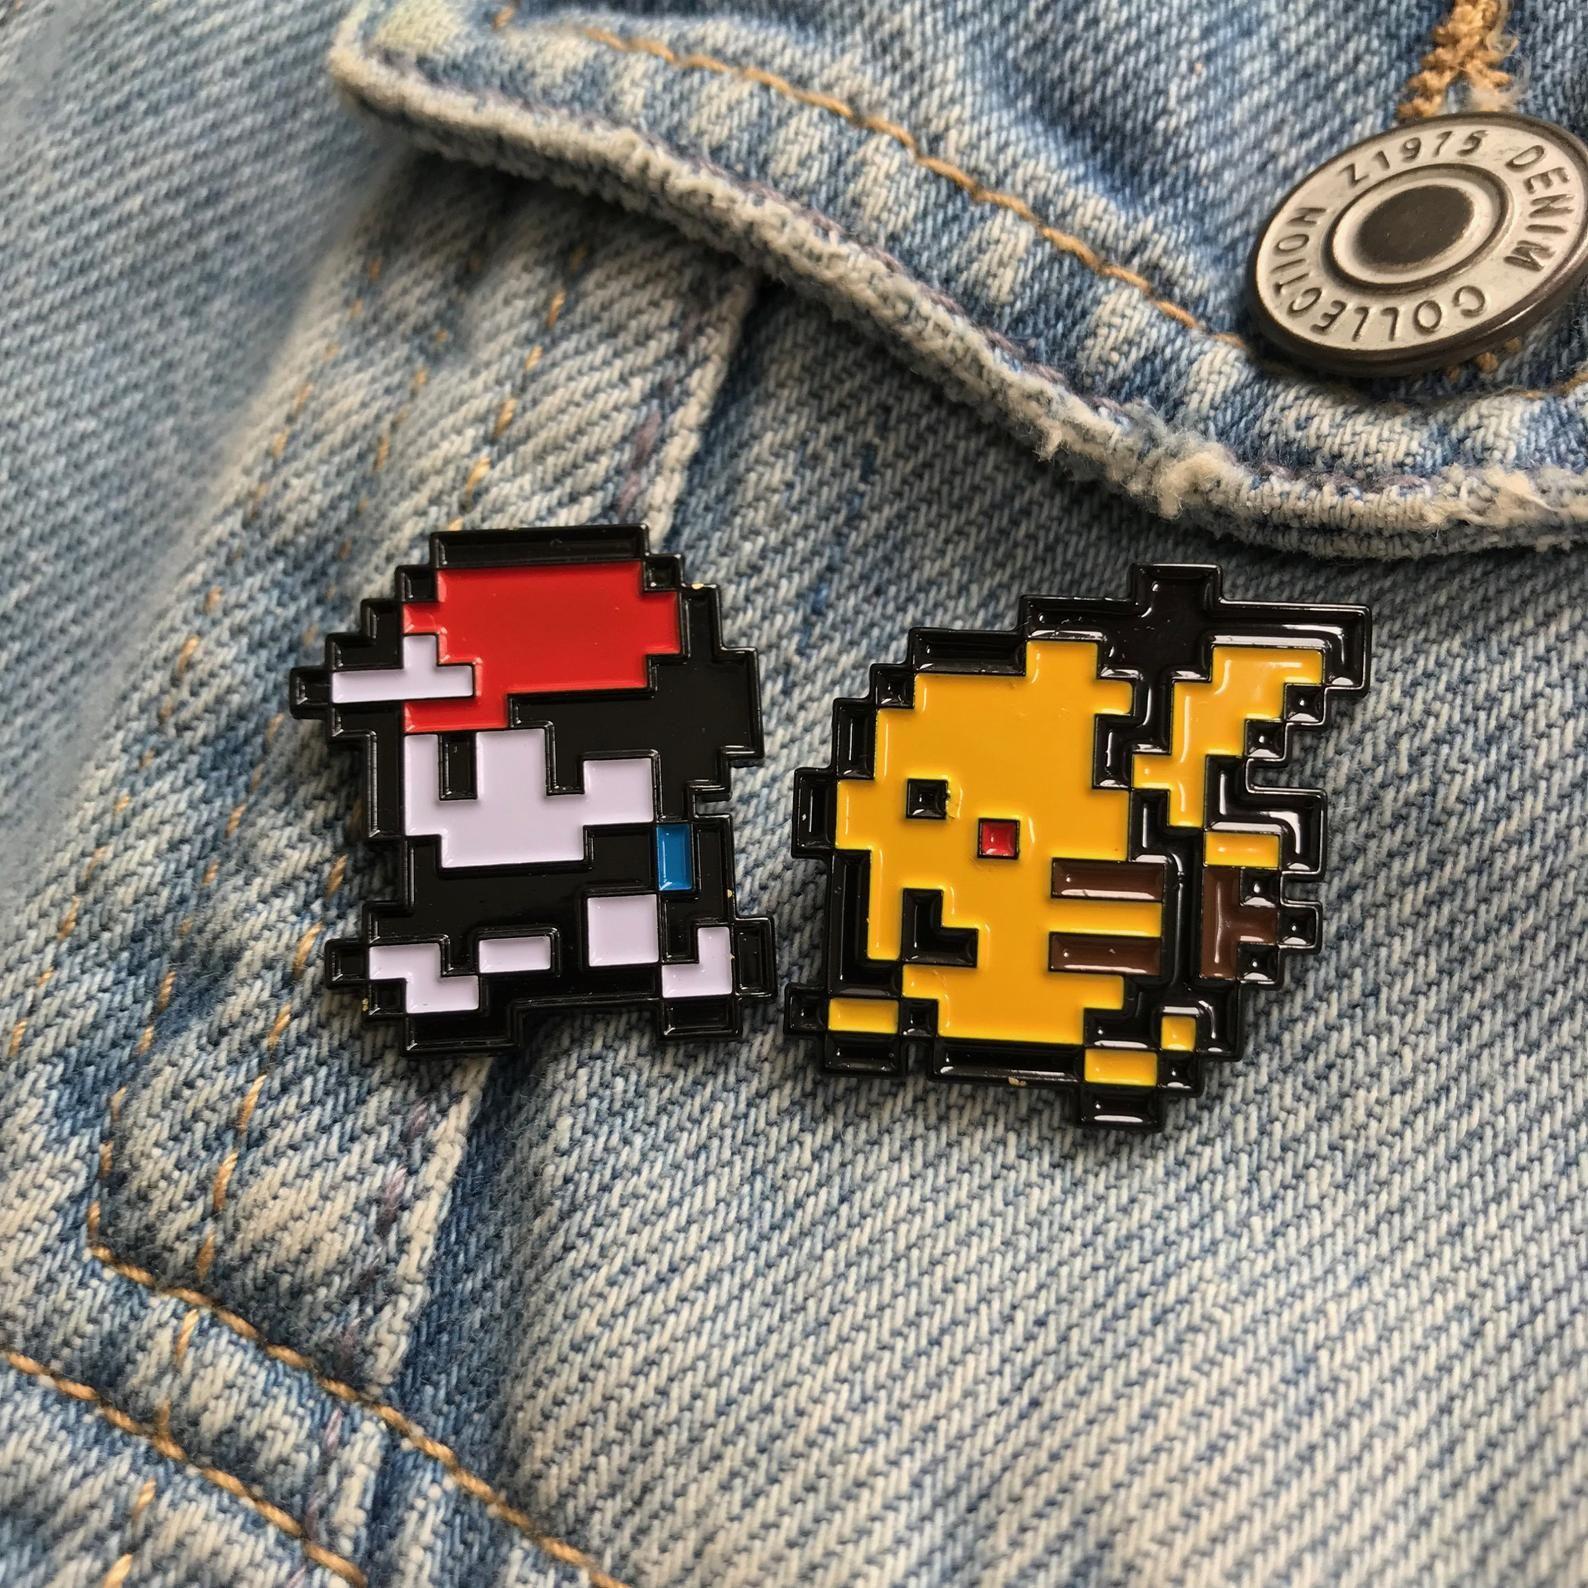 Classic Pokemon Sprite Pixel 8 bit Enamel Pin BadgesPokemon Red Blue Yellow